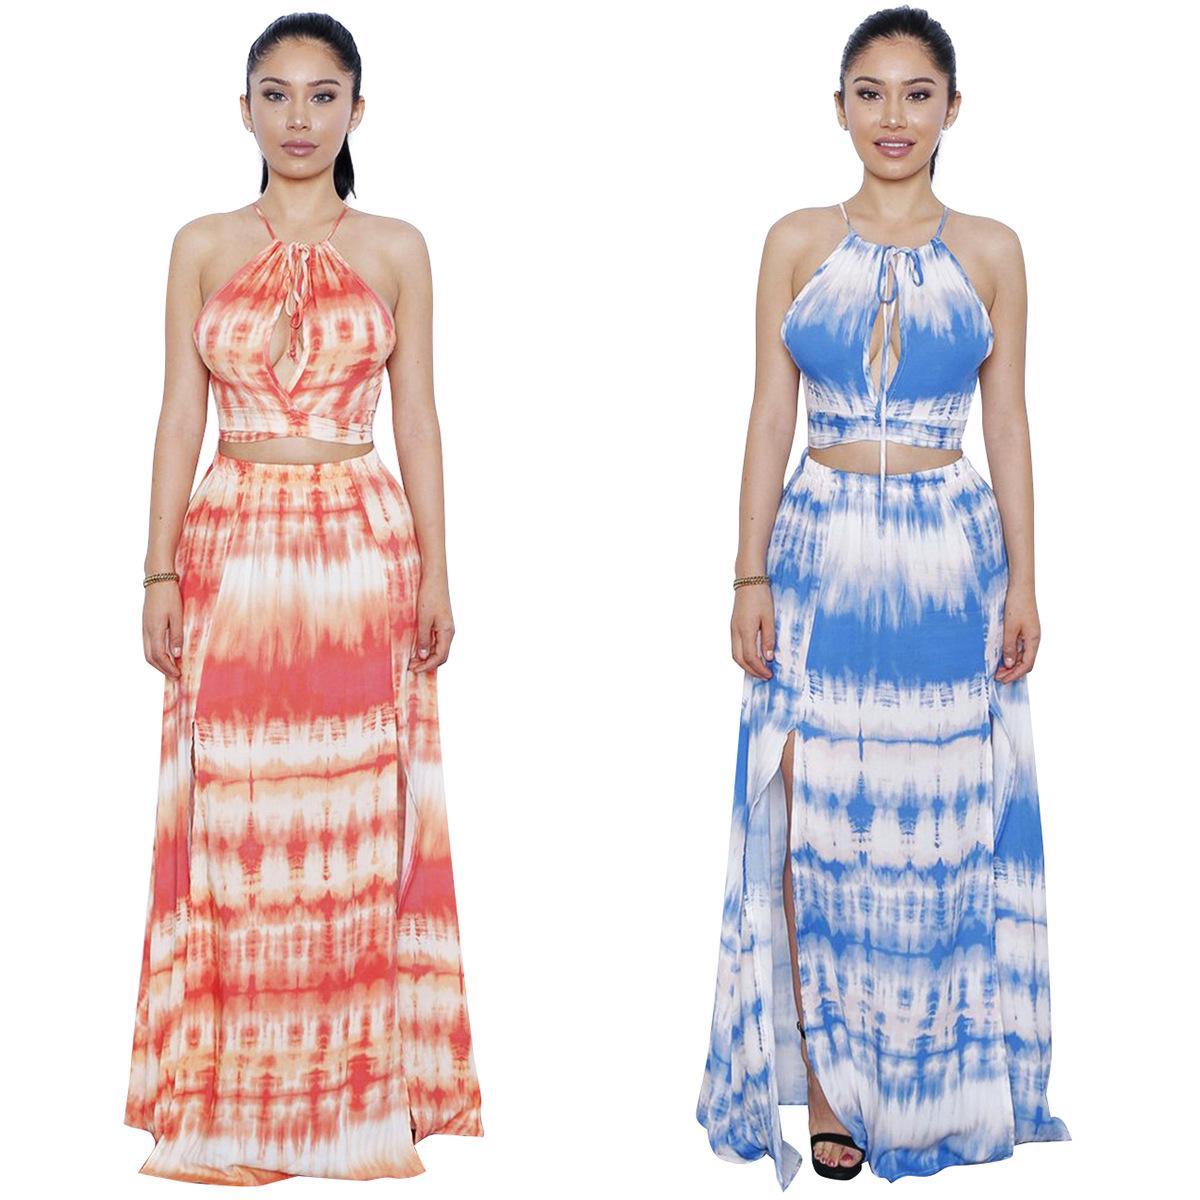 Spring Summer Graffiti Floral Print Halter Off Shoulder Sleeveless Short Top Long Split Skirt Flowy Beach Party Maxi Long Two Piece Dresses